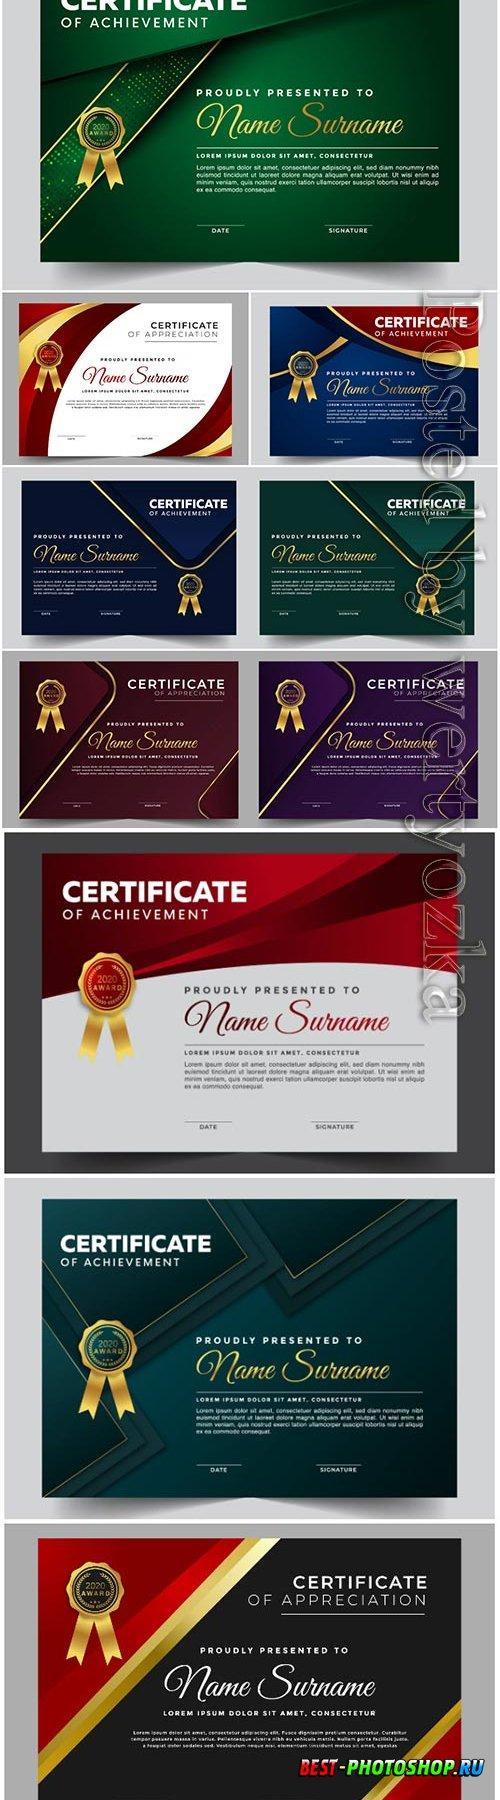 Professional certificate vector design template